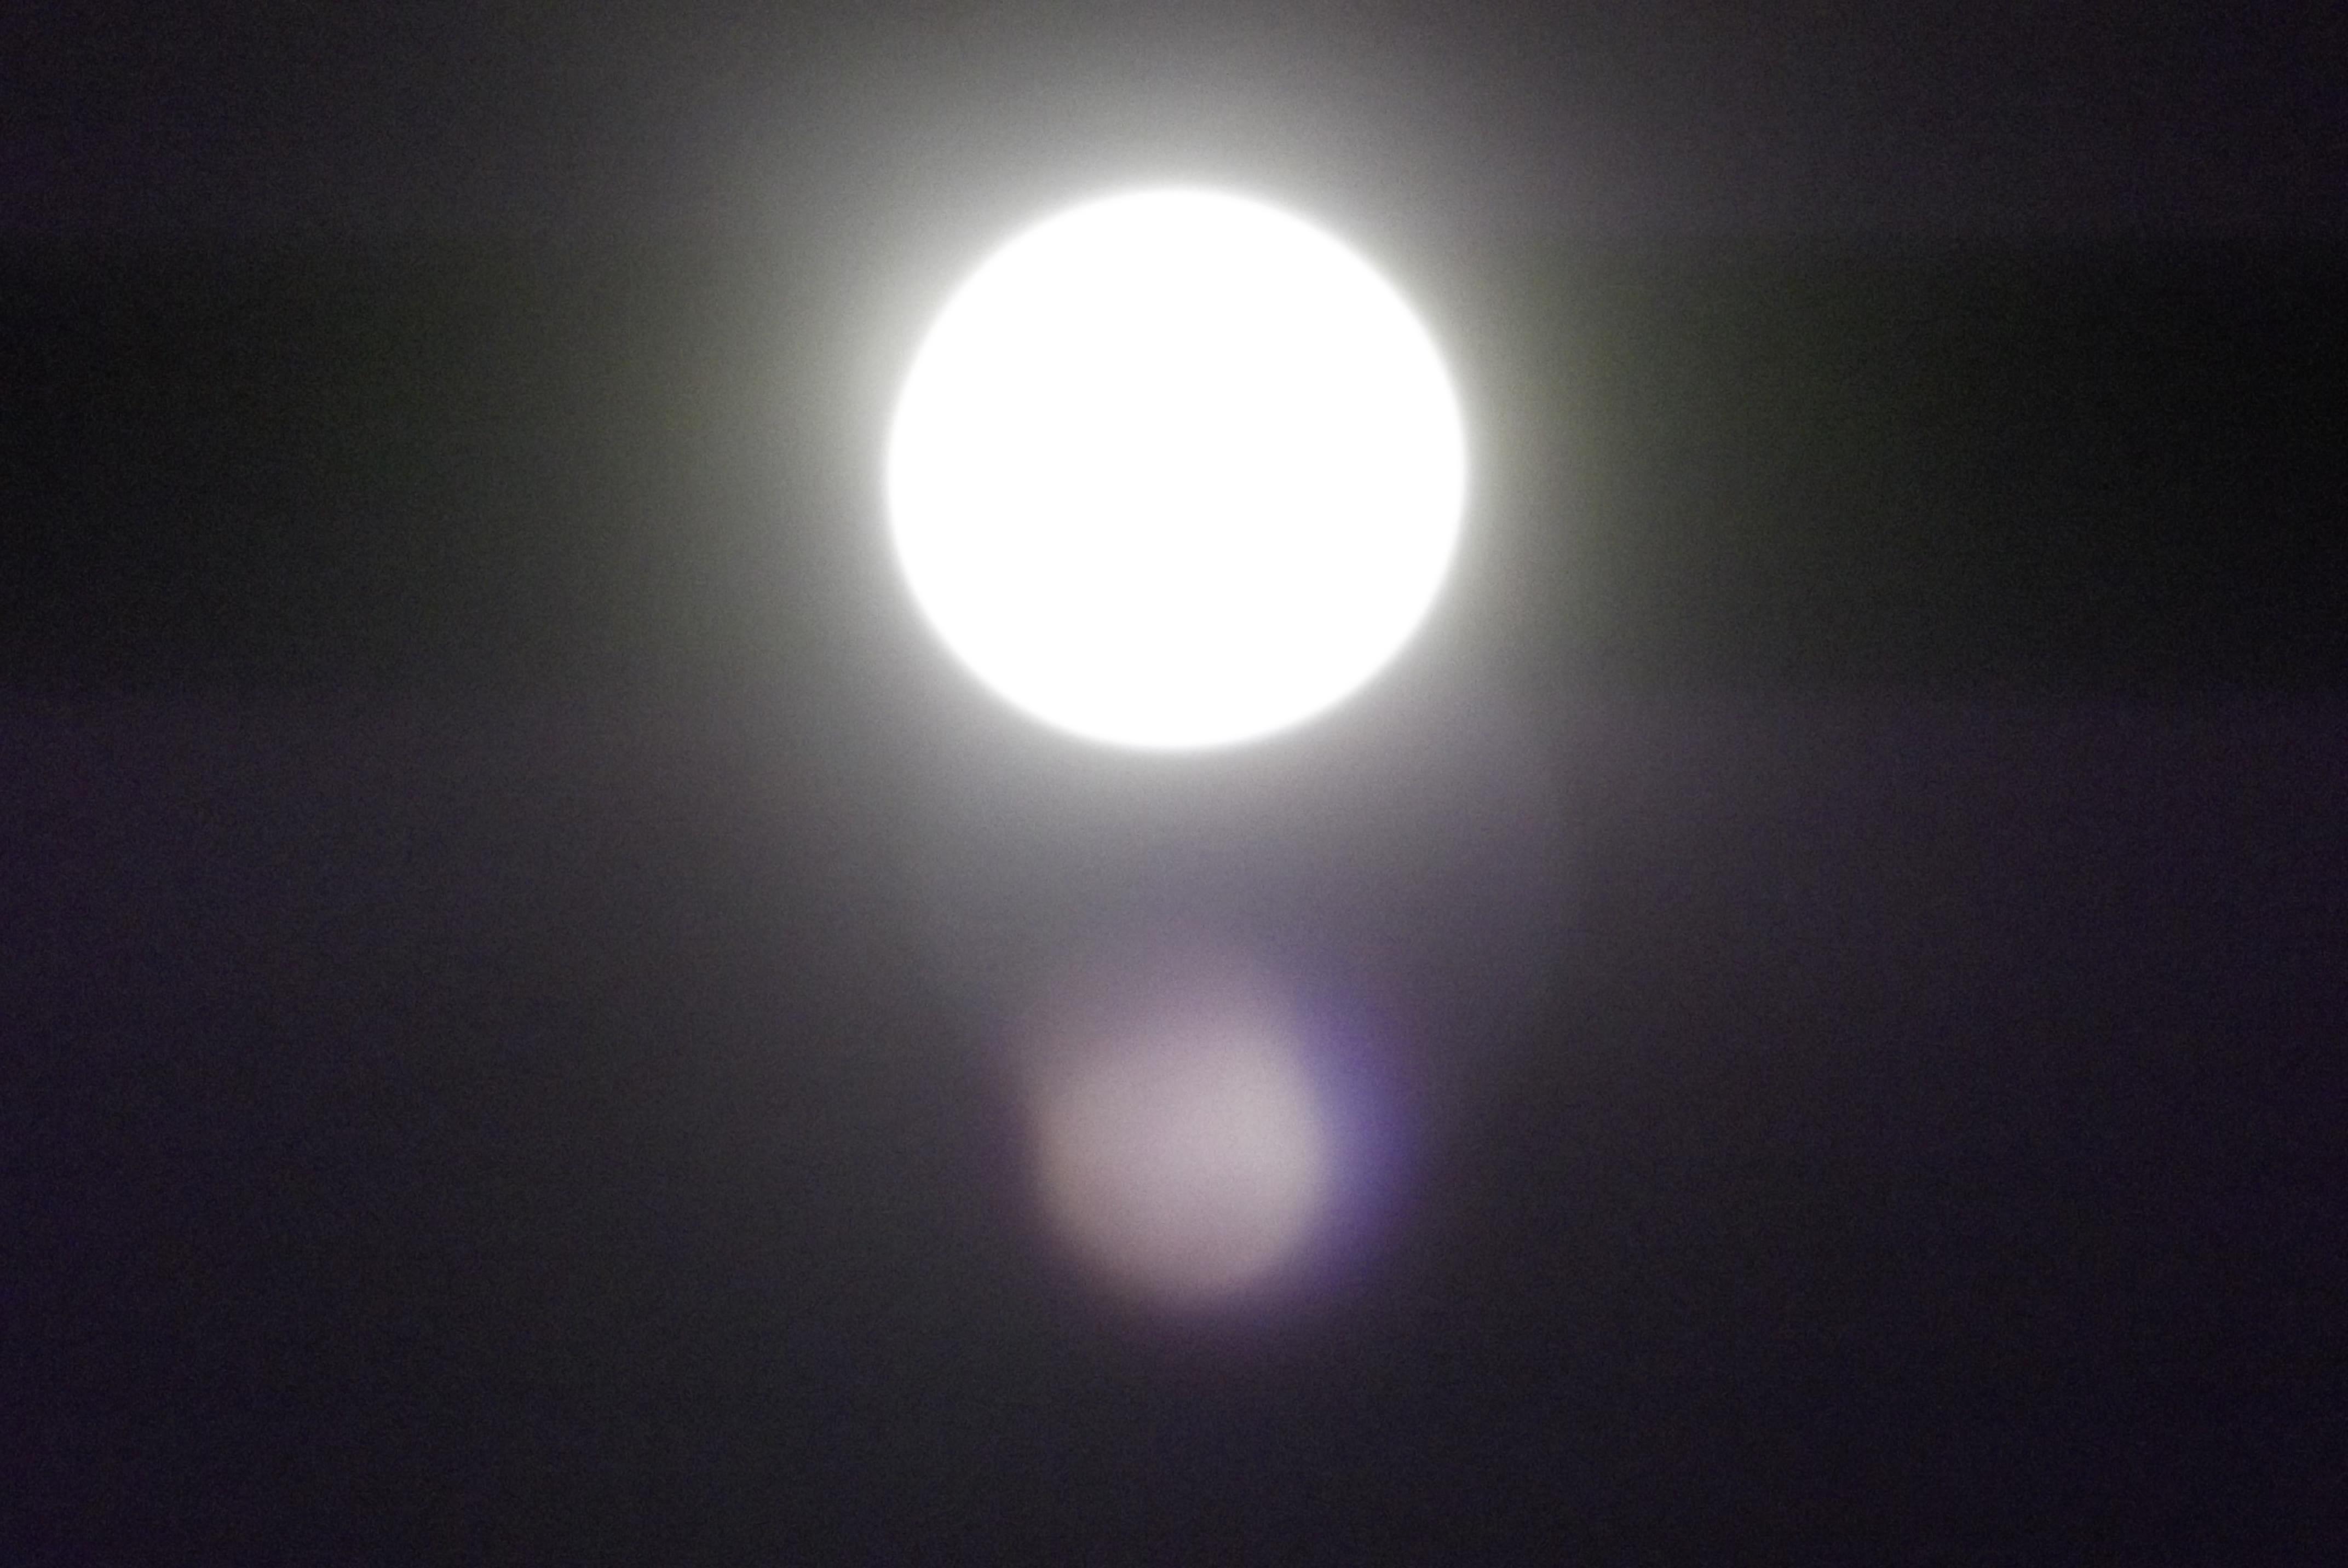 moon & light artifact